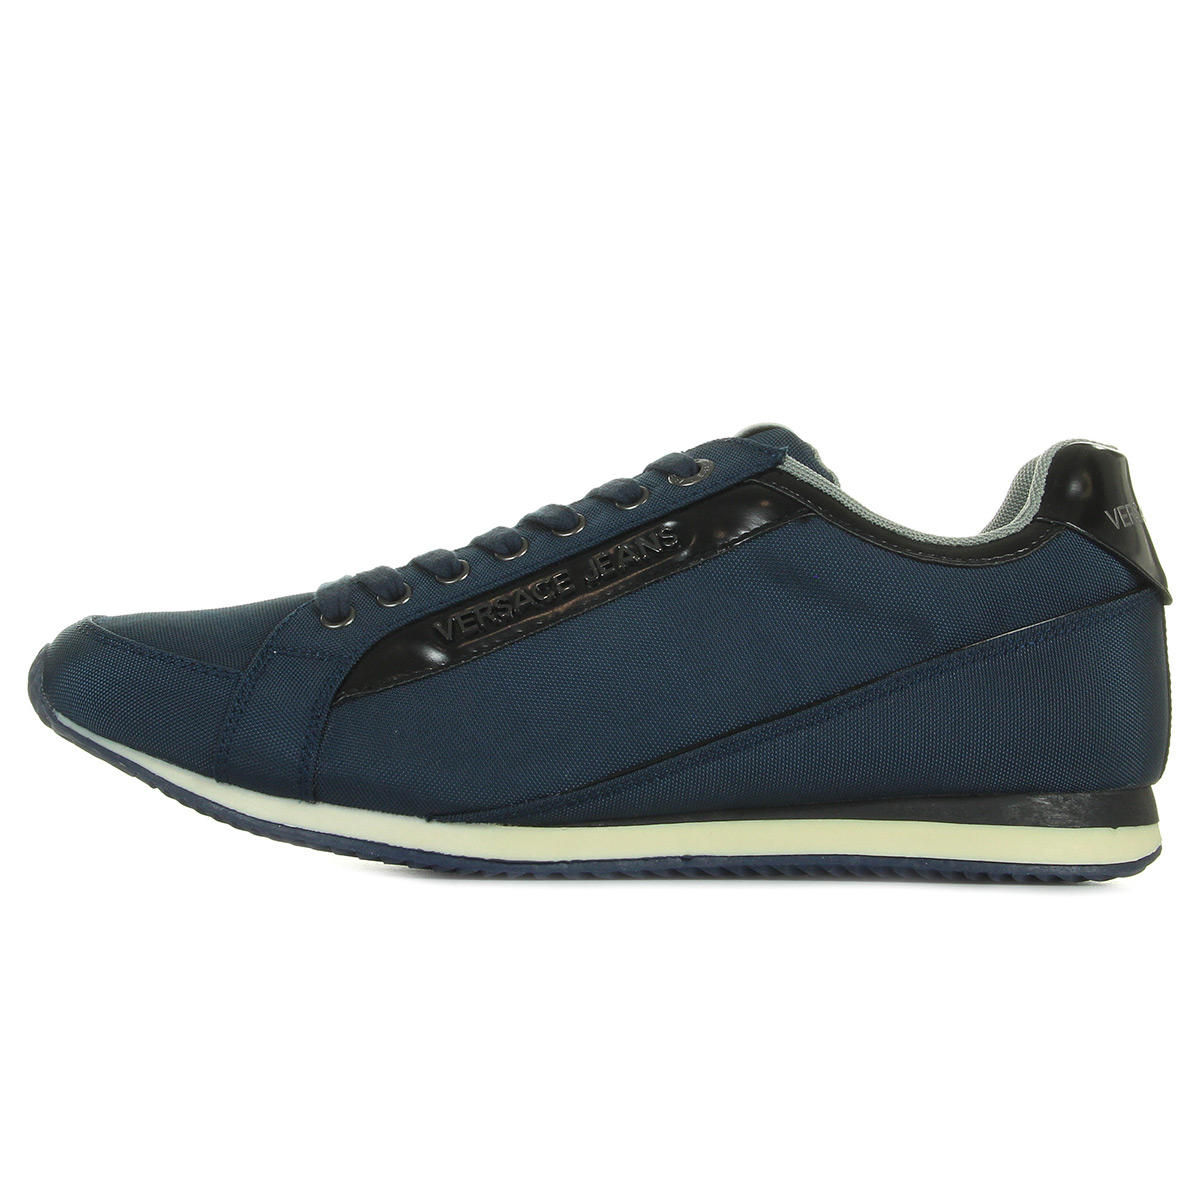 Versace Jeans Sneaker Uomo DisA2 Nylon E0YPBSA2239, Baskets mode homme f5372699d1d